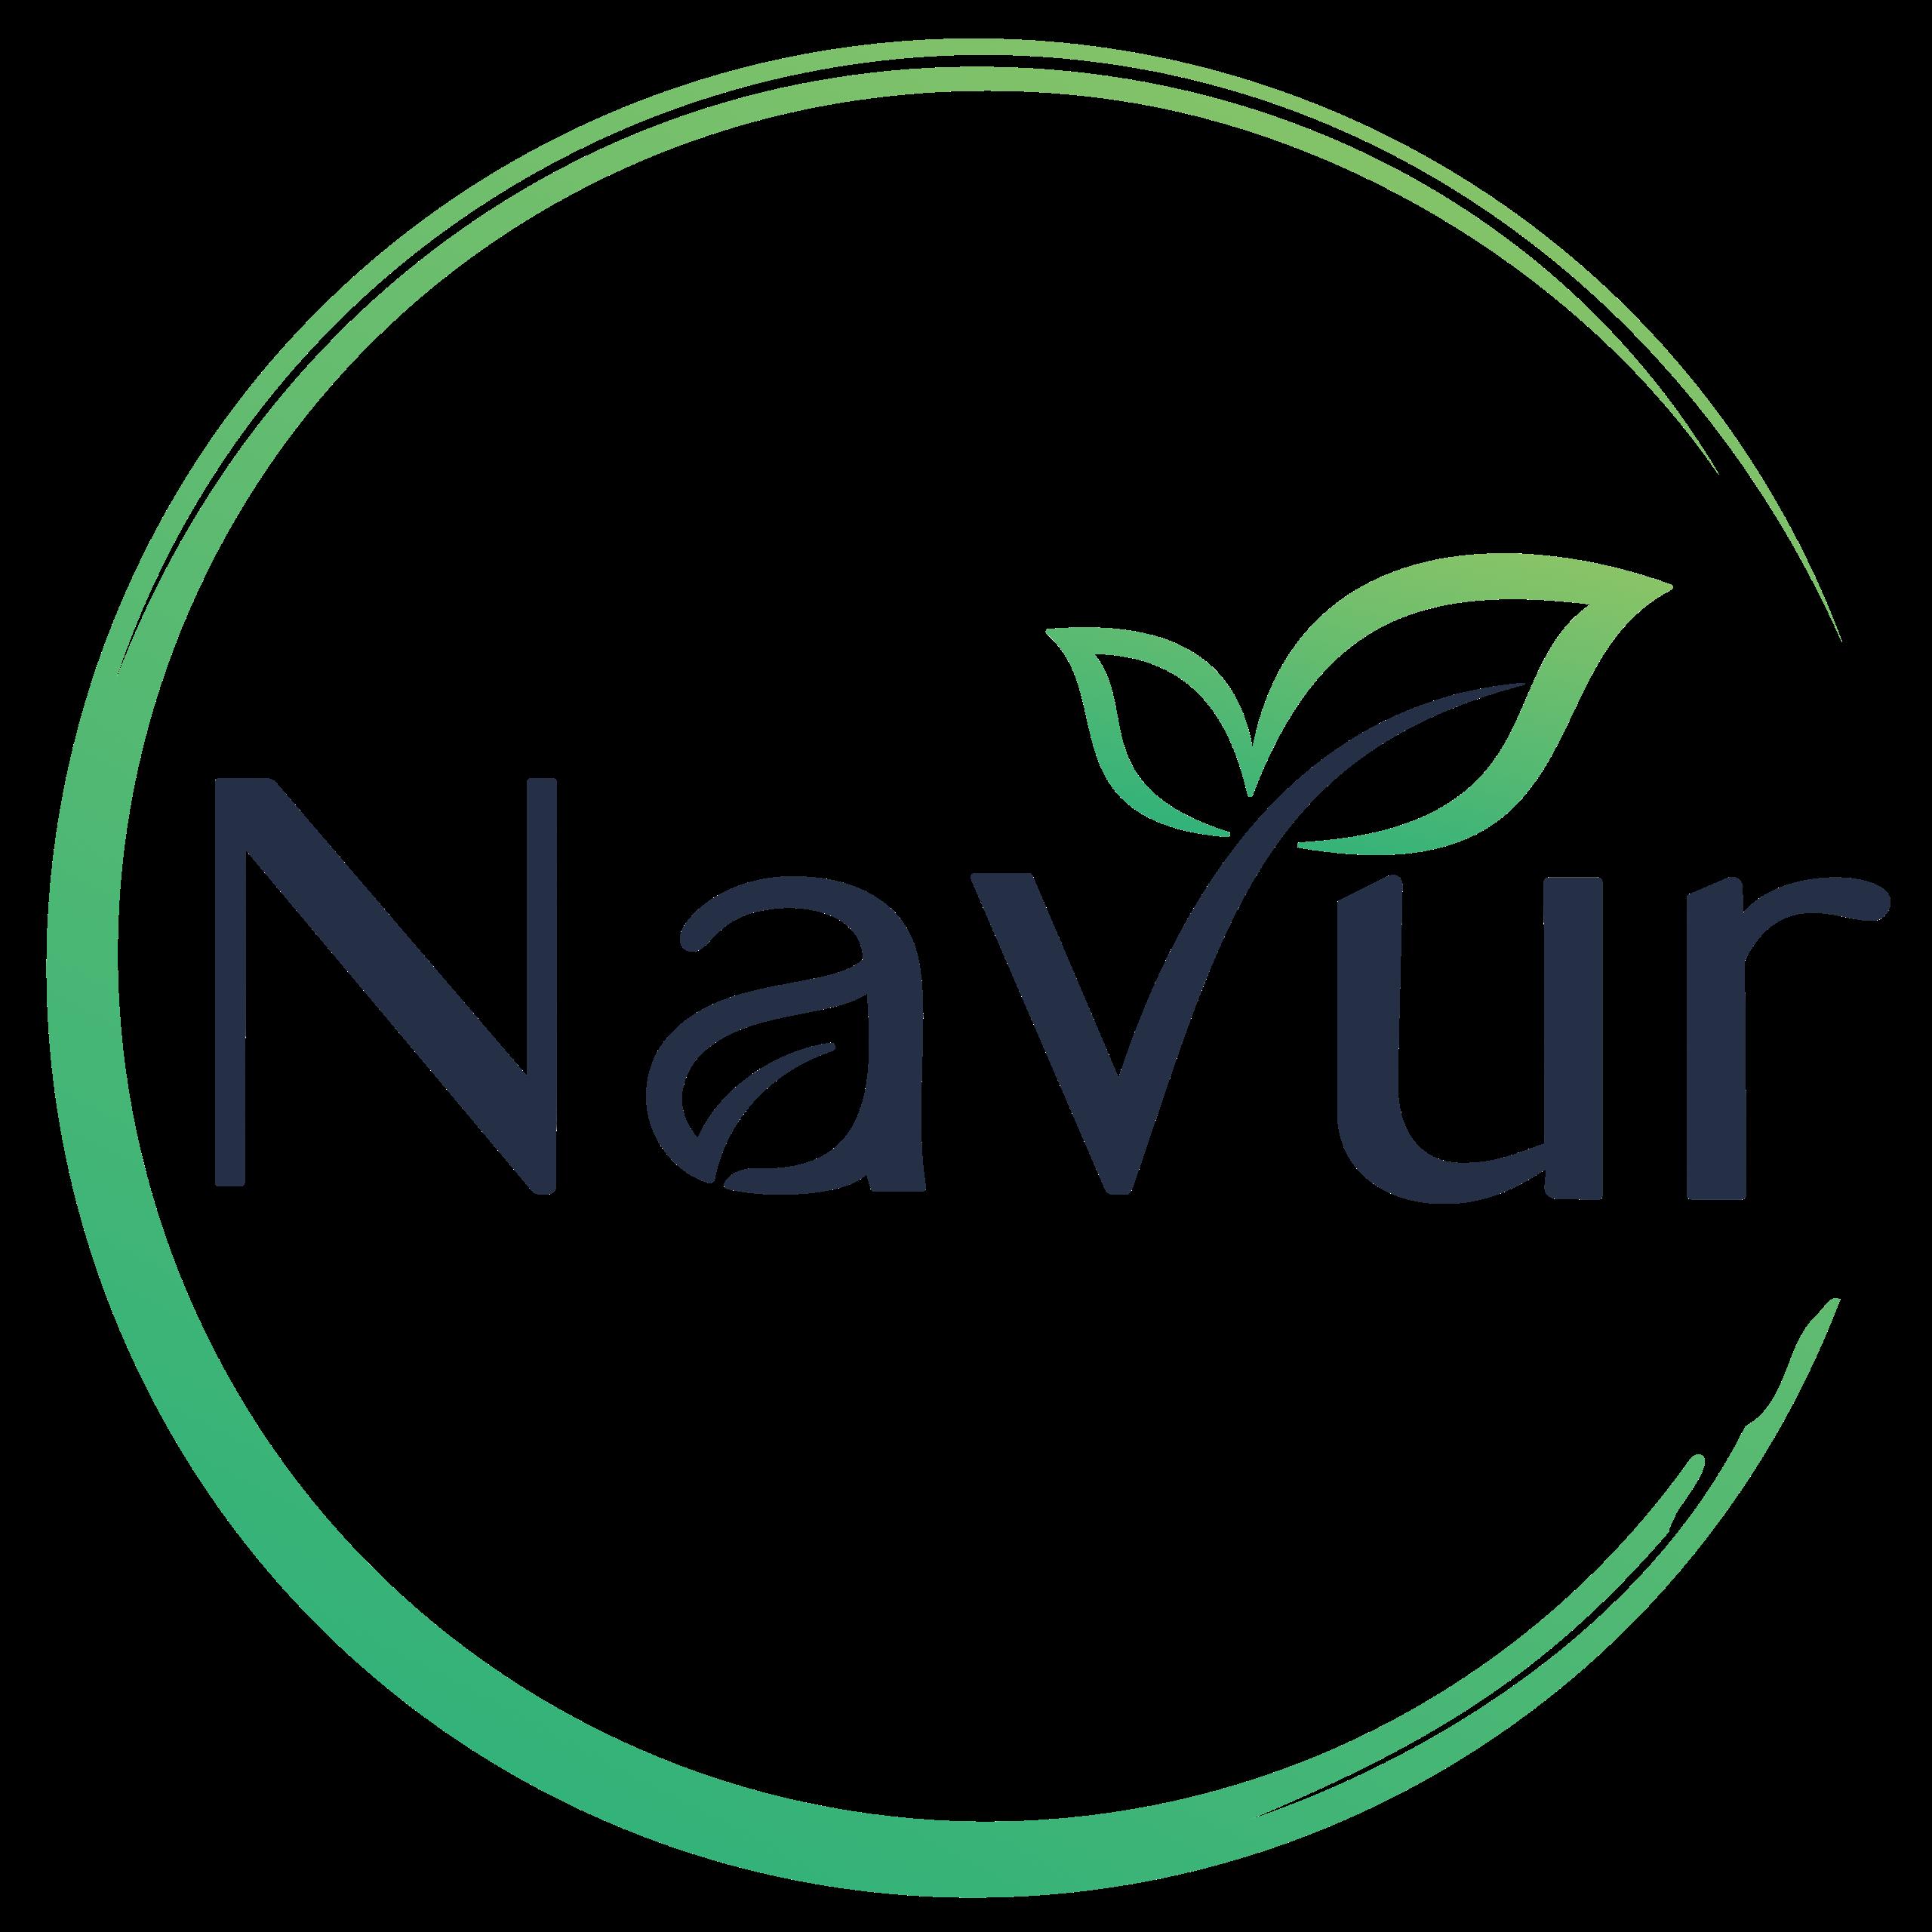 Navur Sprossenglas logo footer